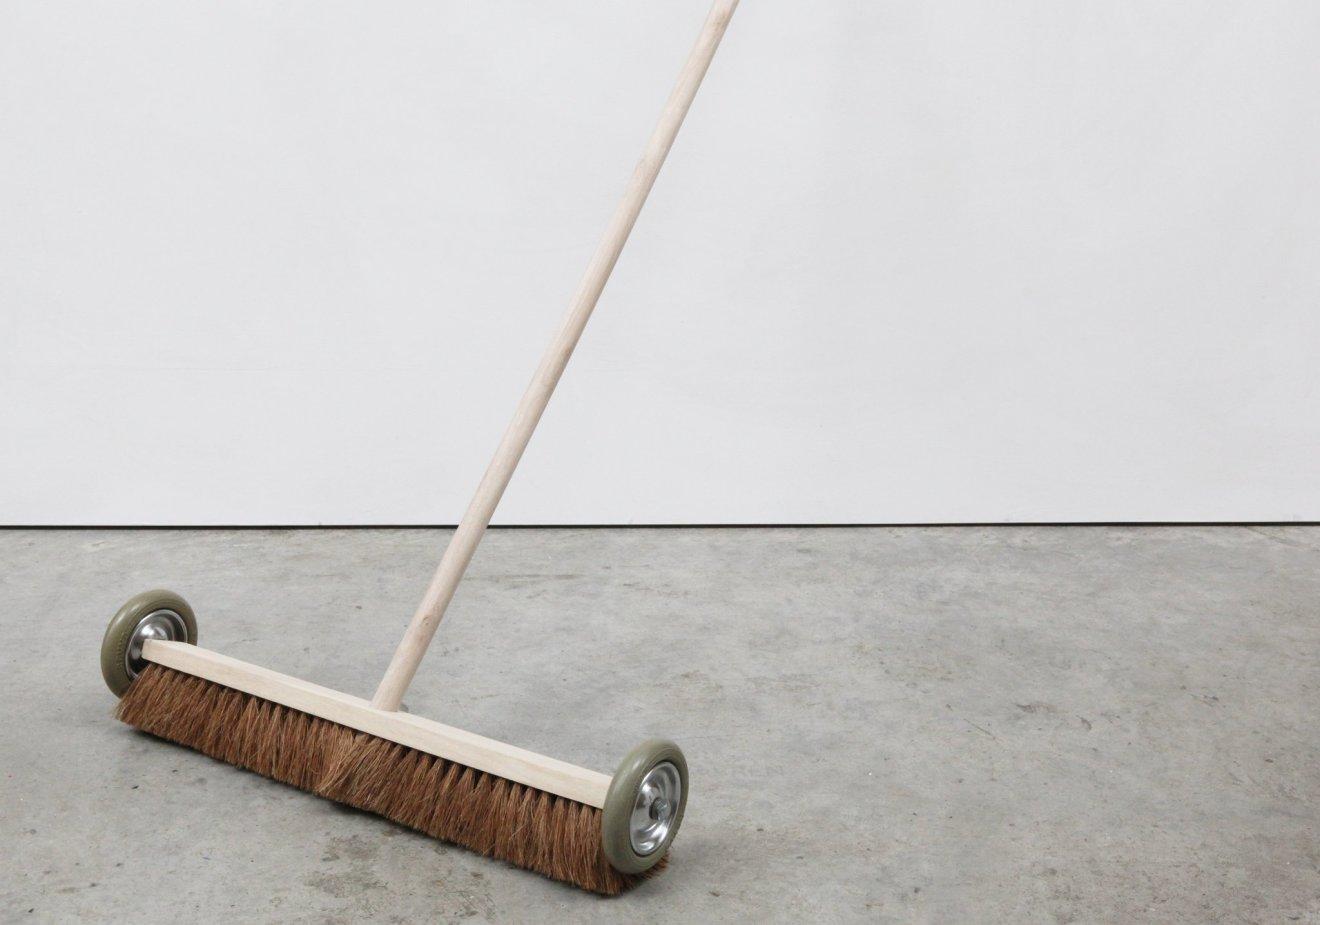 Carl Clerkin, Broooom, 2013